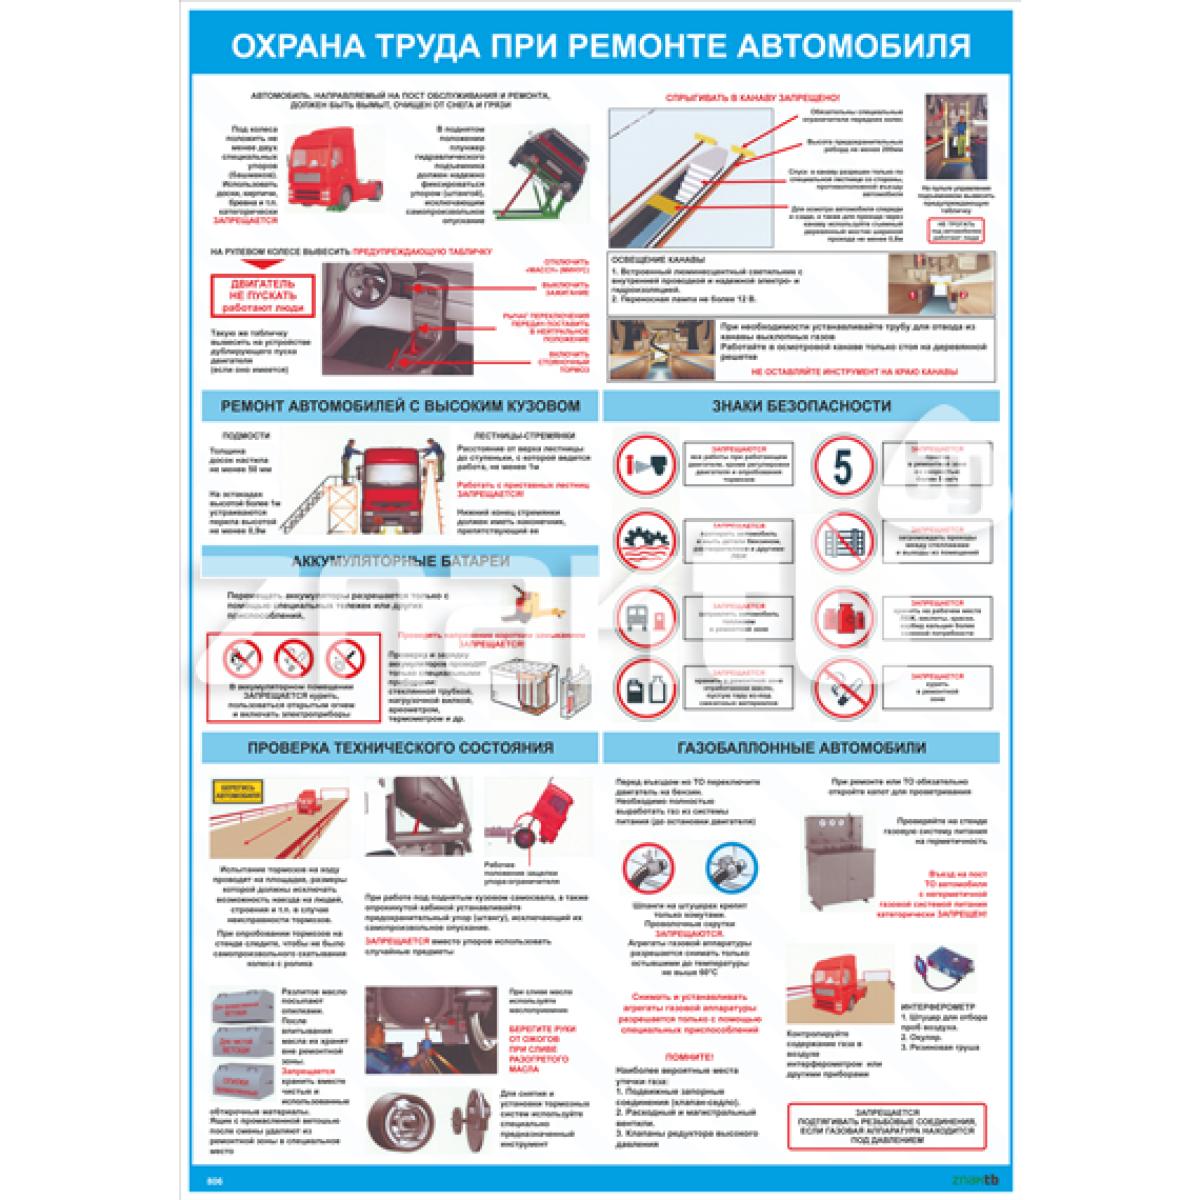 Плакат Охрана труда при ремонте автомобиля